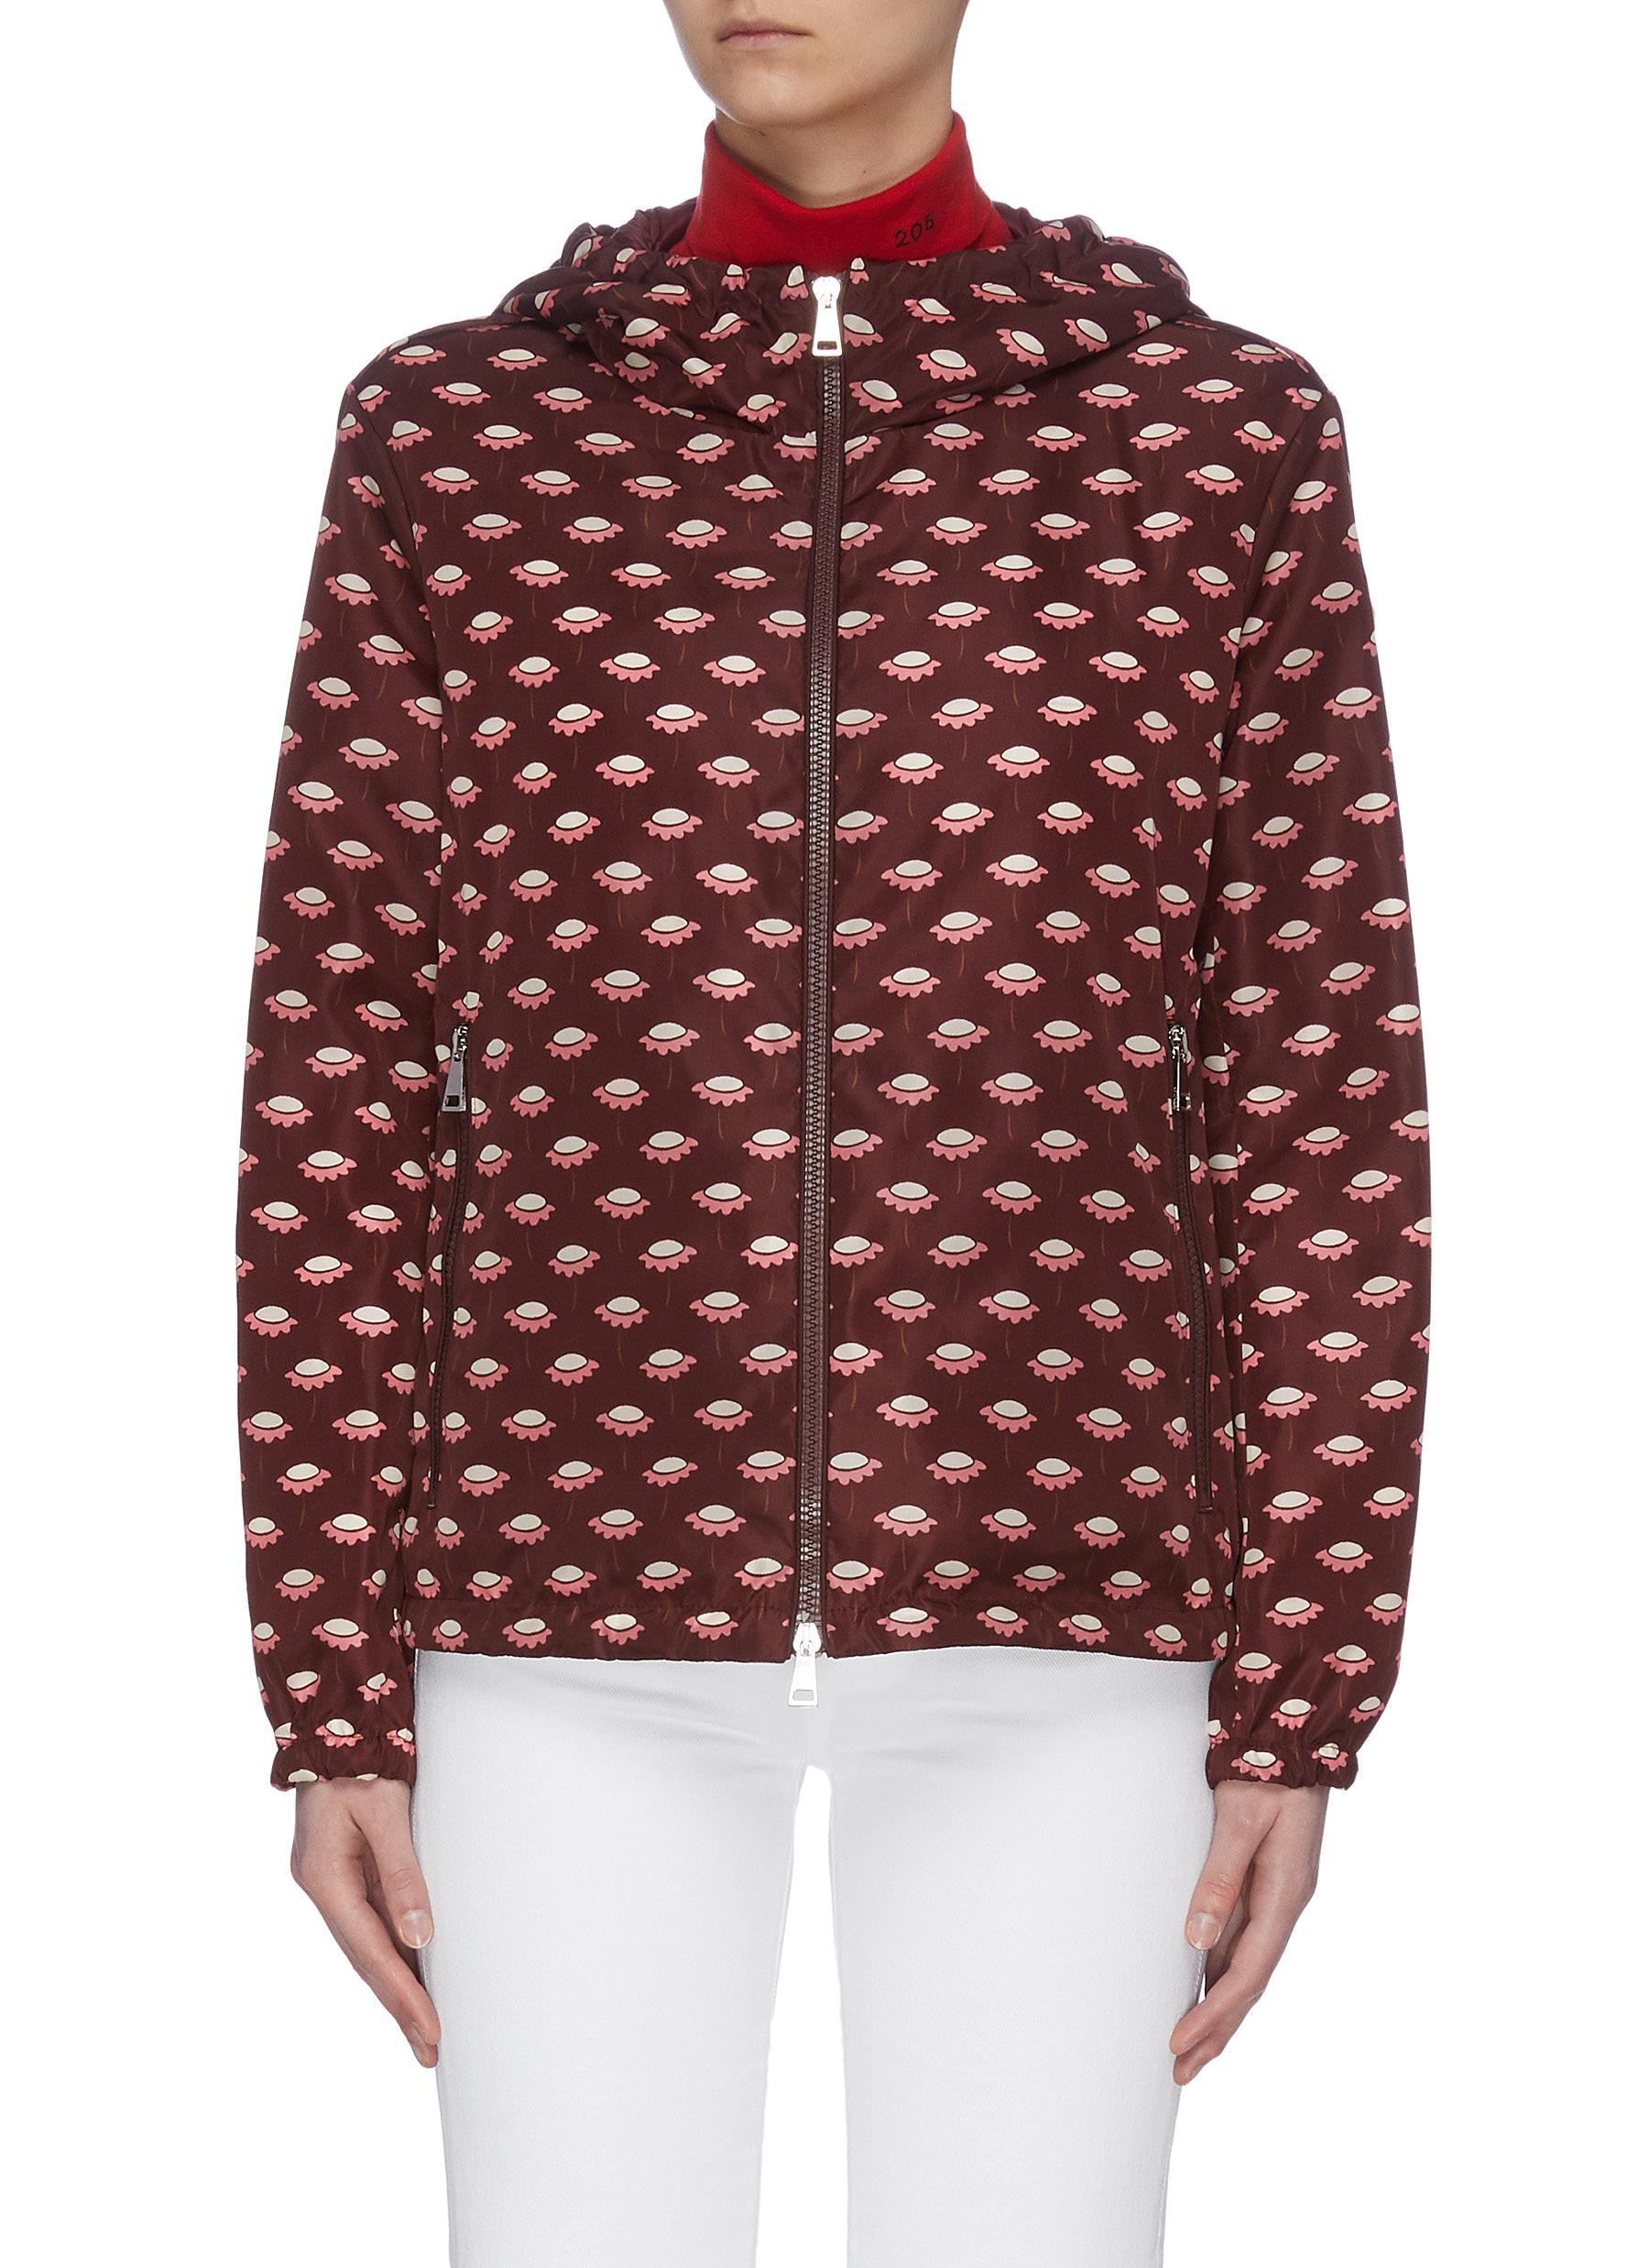 Buy Moncler Jackets 'Argent' floral print hooded windbreaker